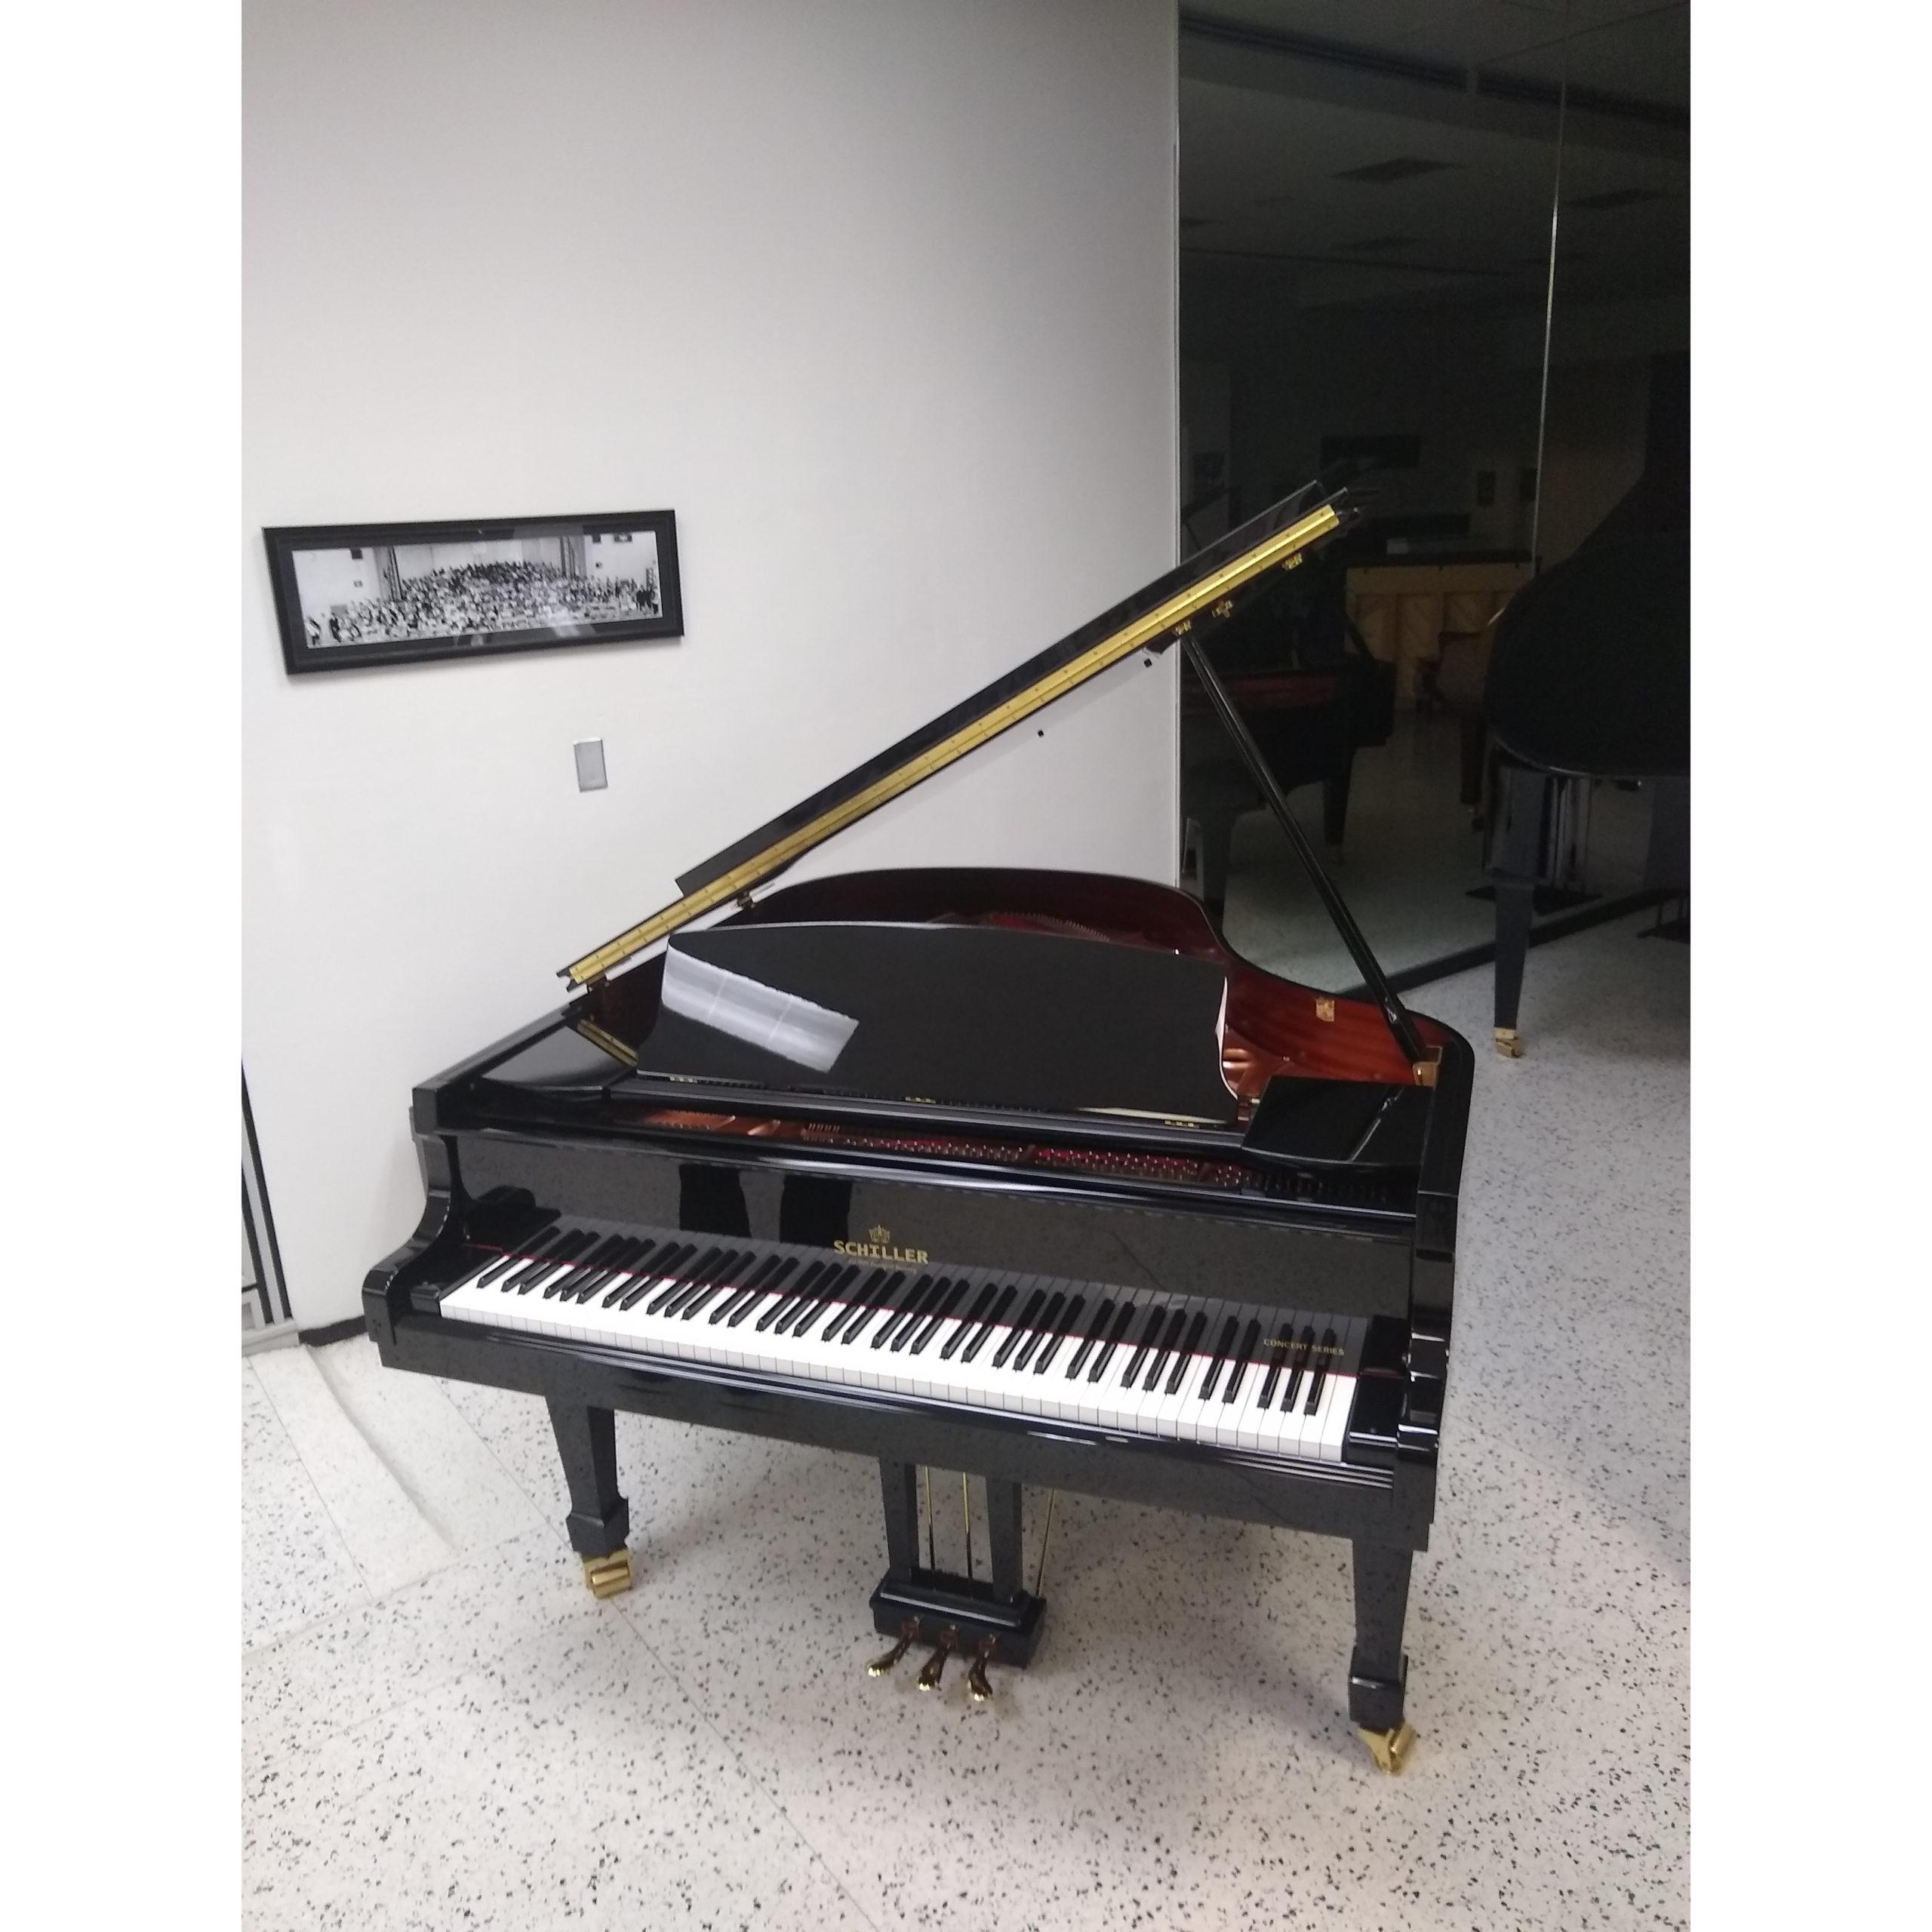 Schiller Concert Series 5.5 Grand Piano